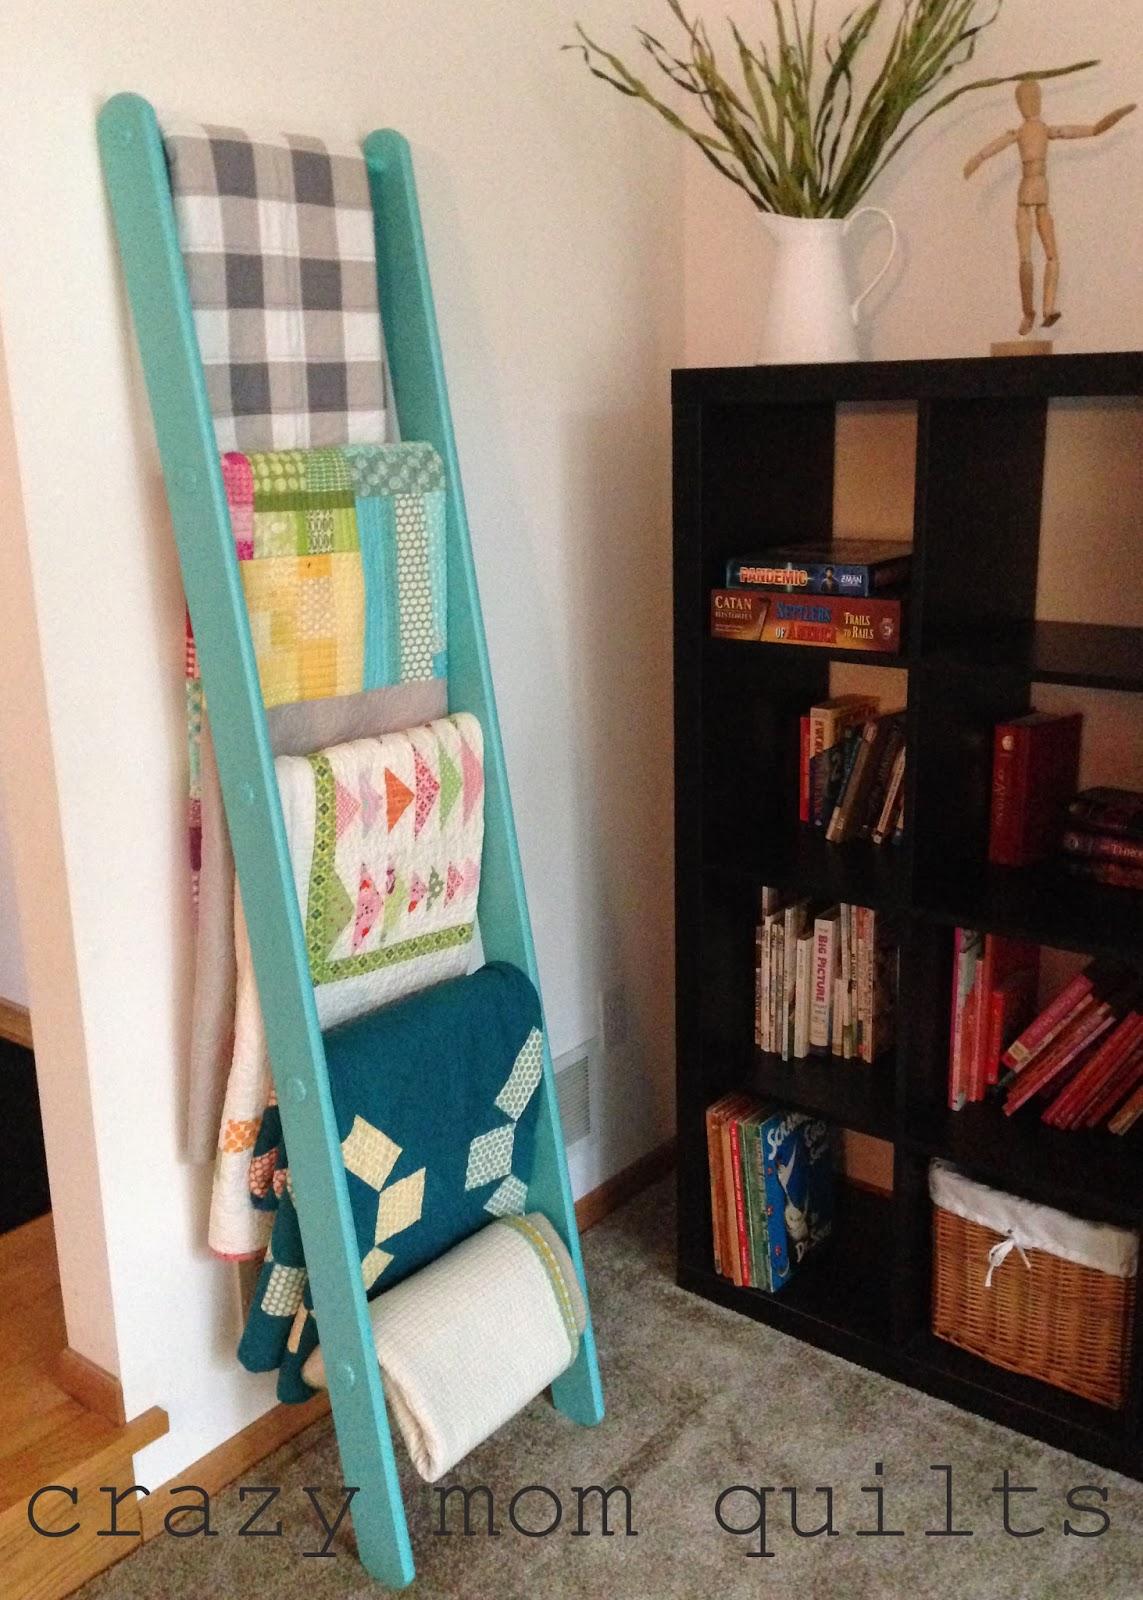 crazy mom quilts: alternatives to hibernating